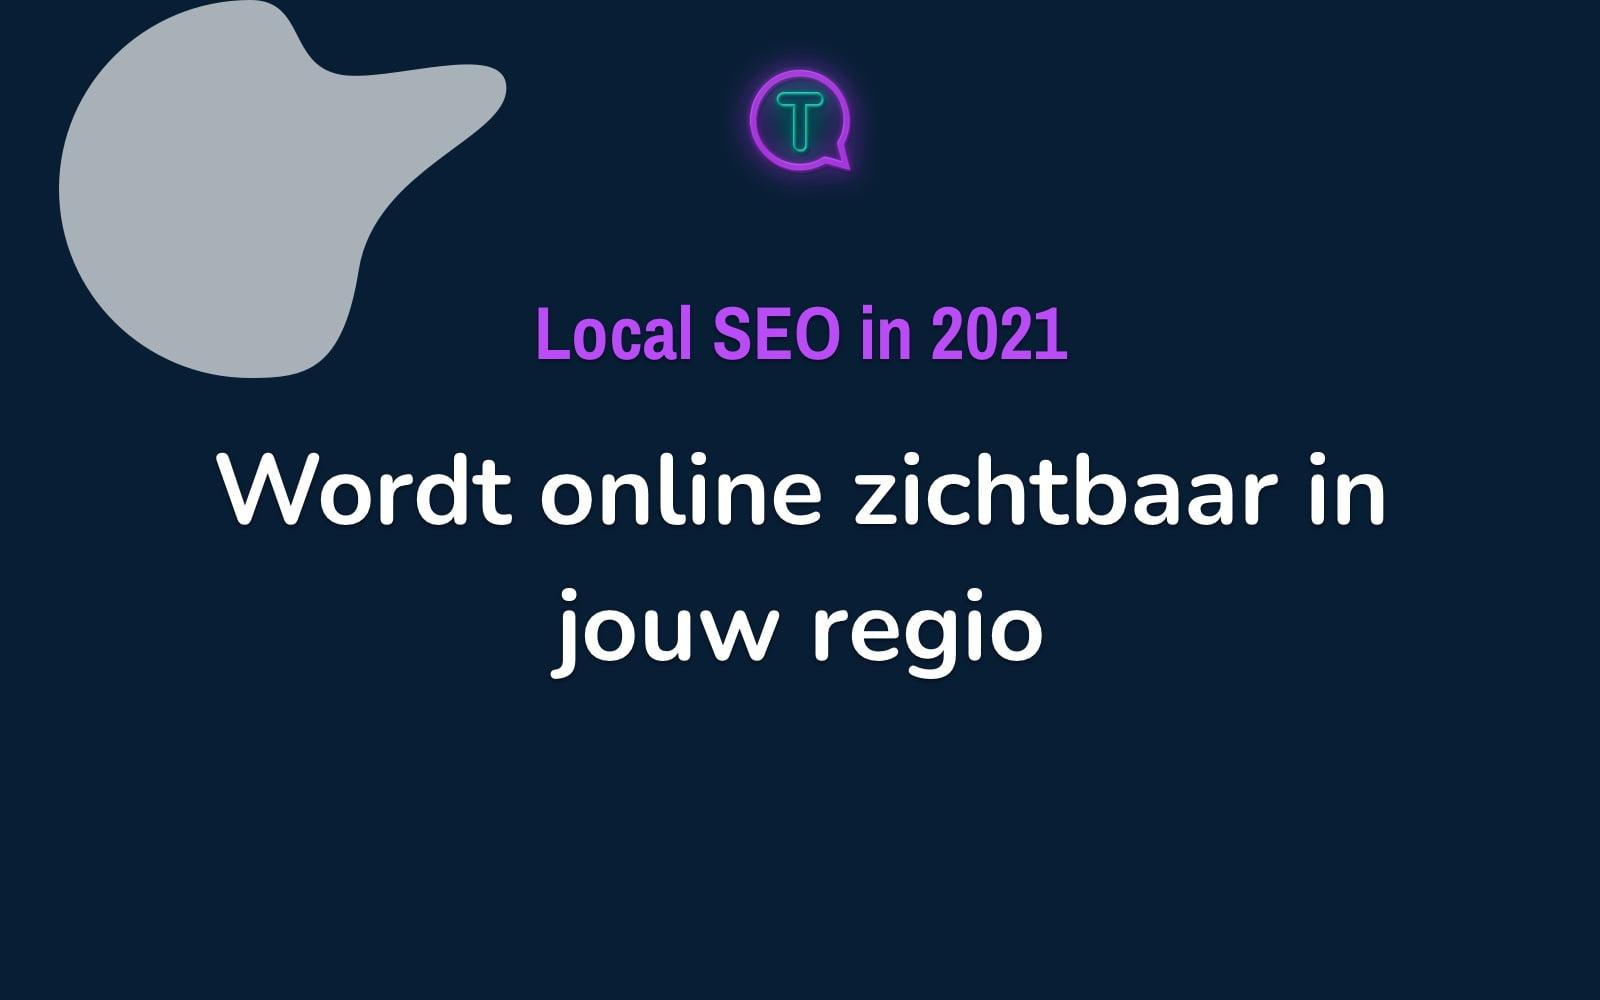 Local SEO in 2021